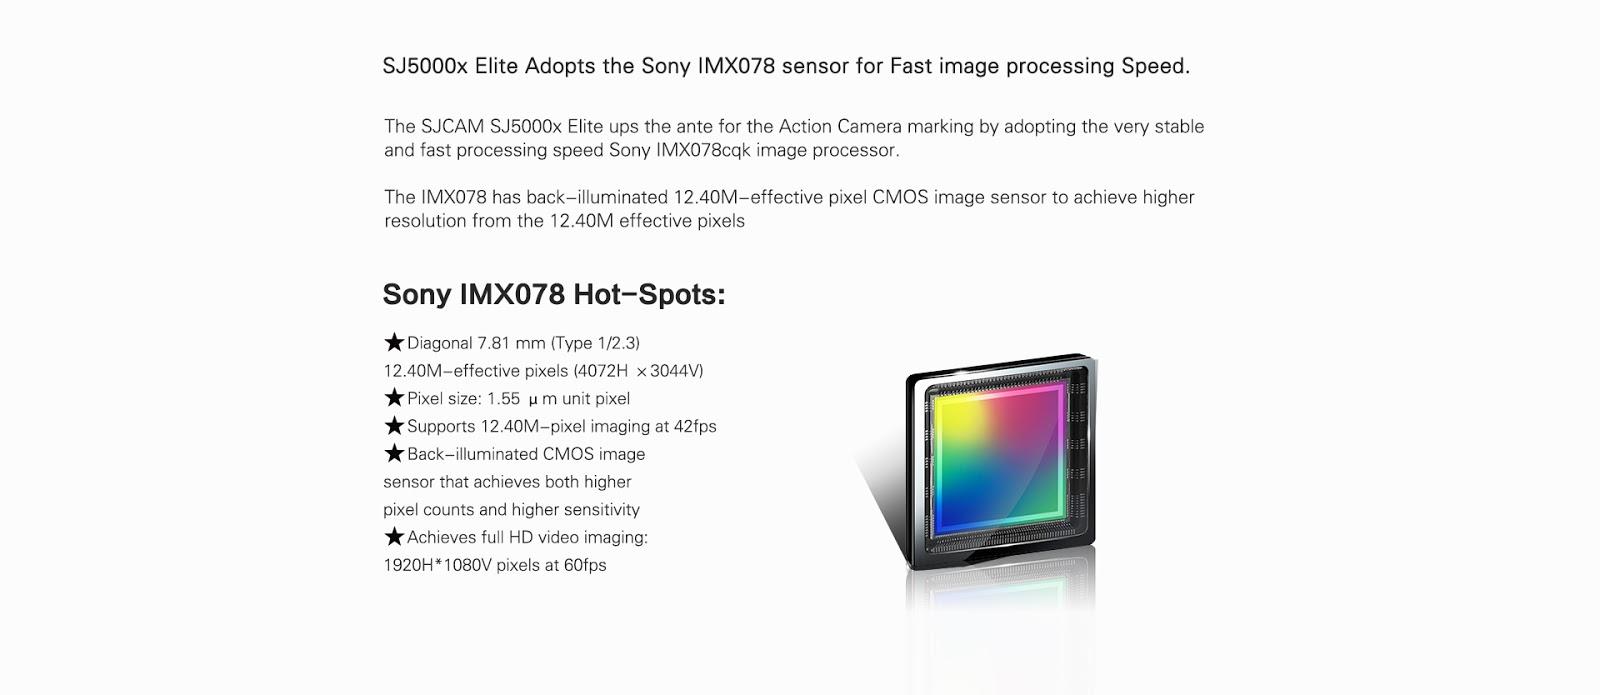 SJCAM SJ5000X Elite Edition Sony IMX078 4K Action Camera with Gyro